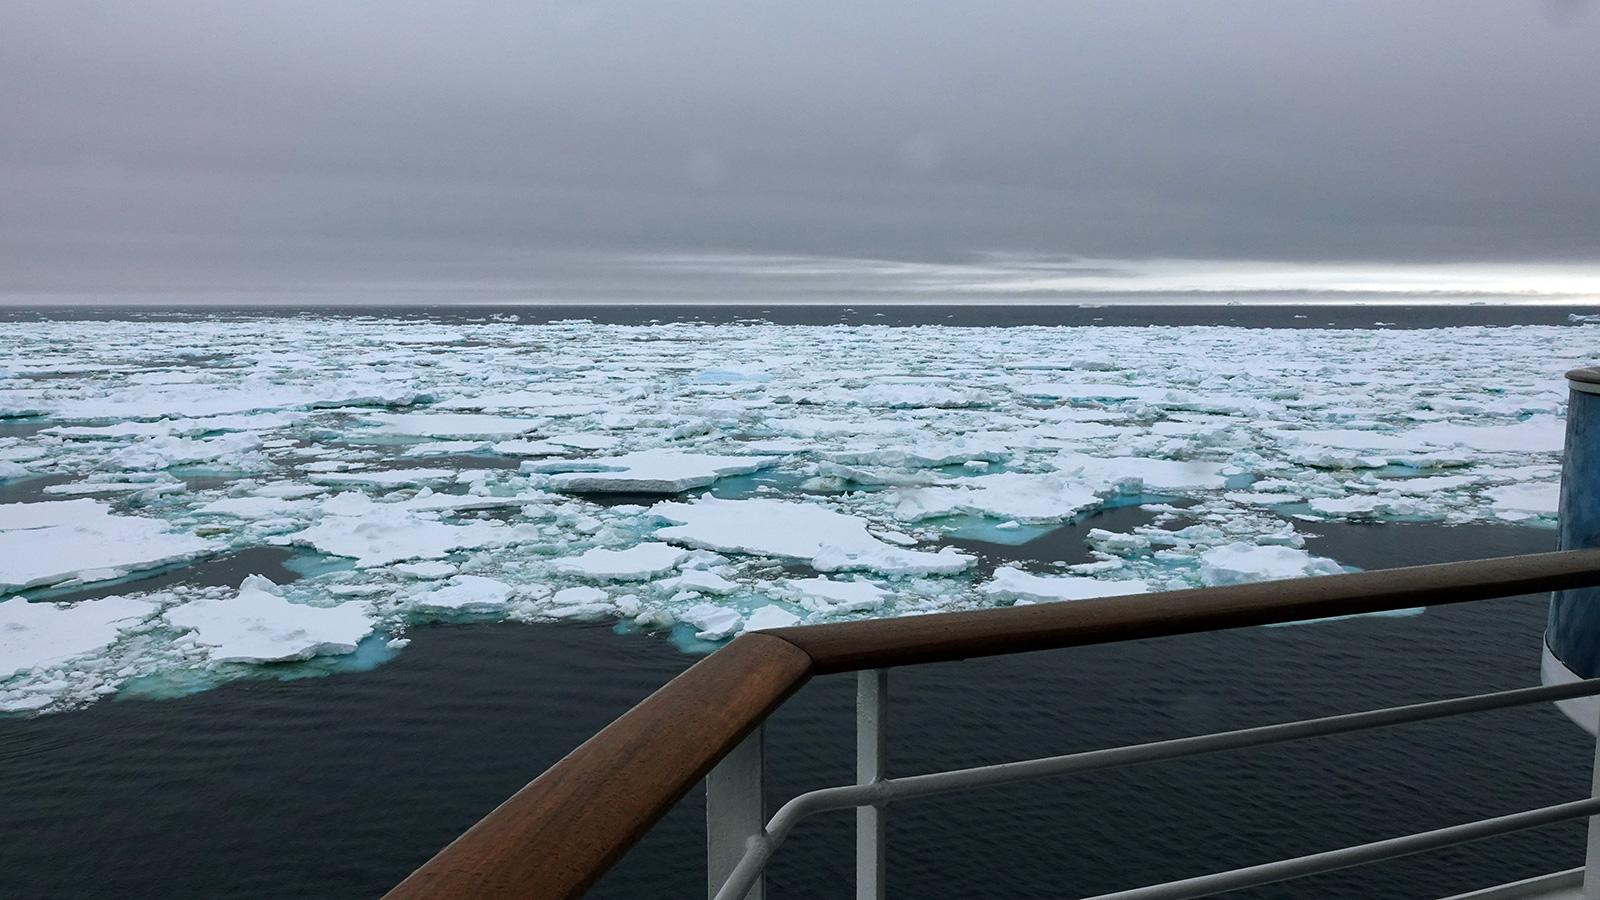 Sea Ice, South Shetland Islands, Antarctica.